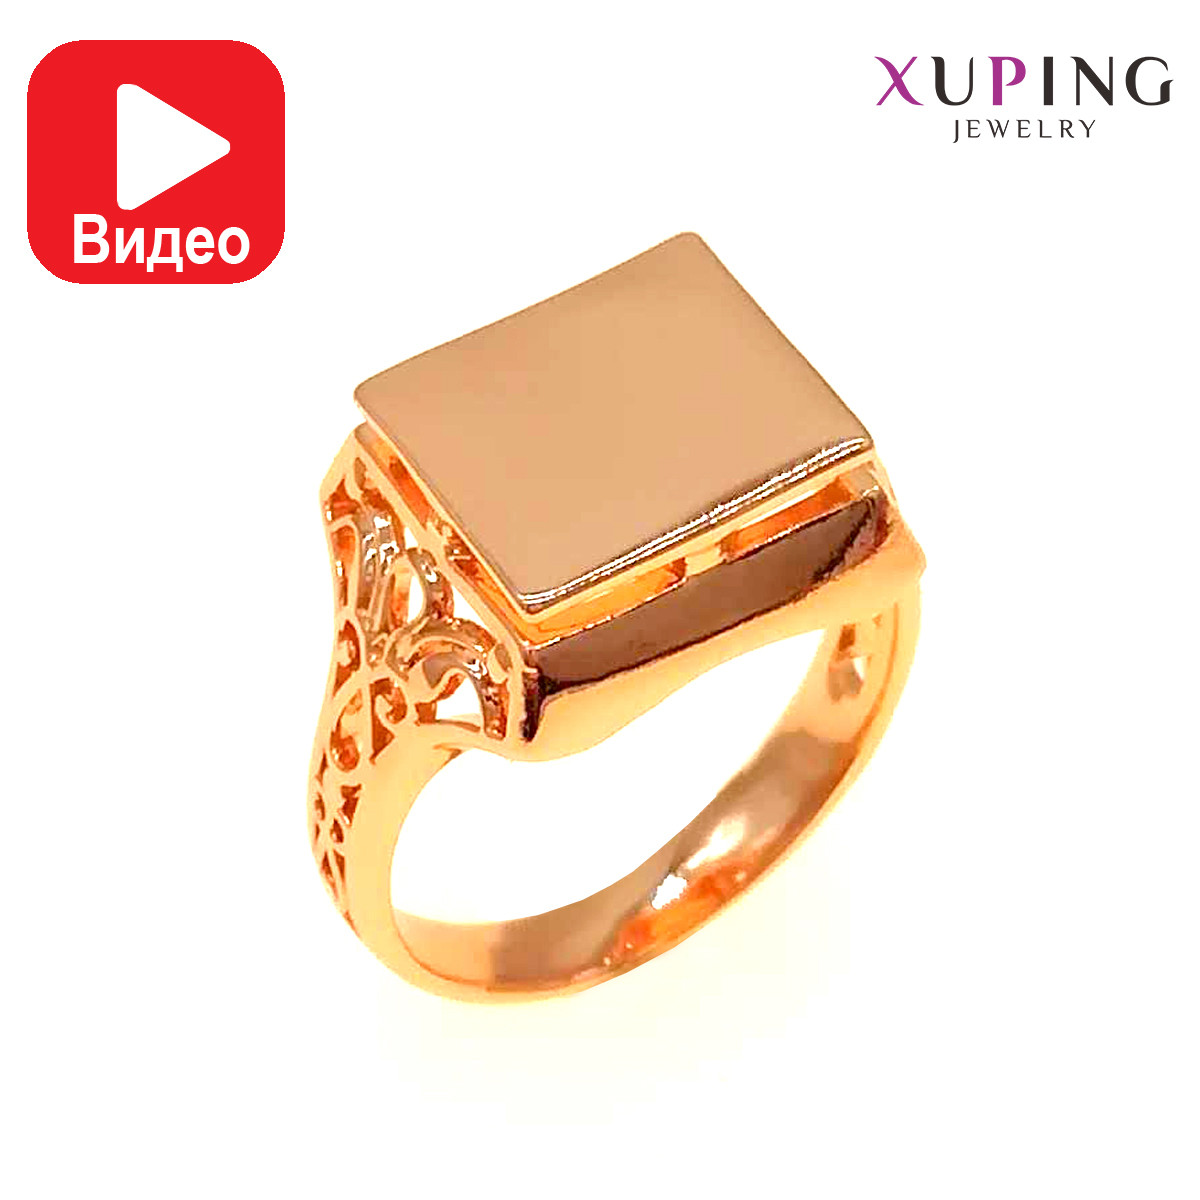 Мужское кольцо (печатка) Xuping из медицинского золота, позолота 18K,  ХР00427 (22)